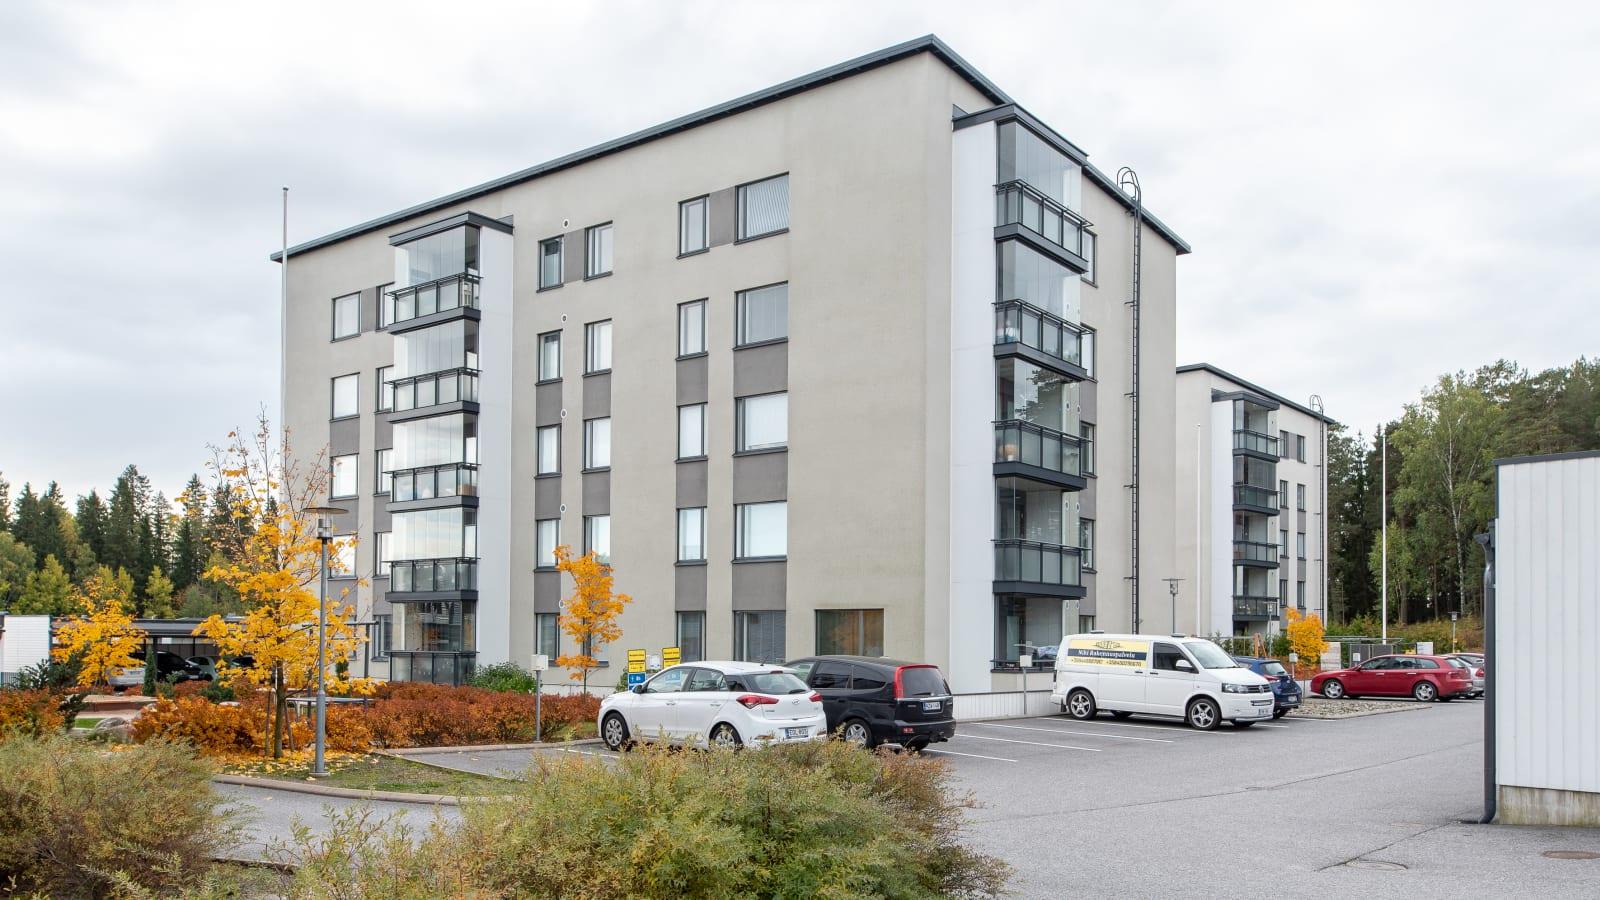 Turku, Pläkkikaupunki, Lukkosepänkatu 5a